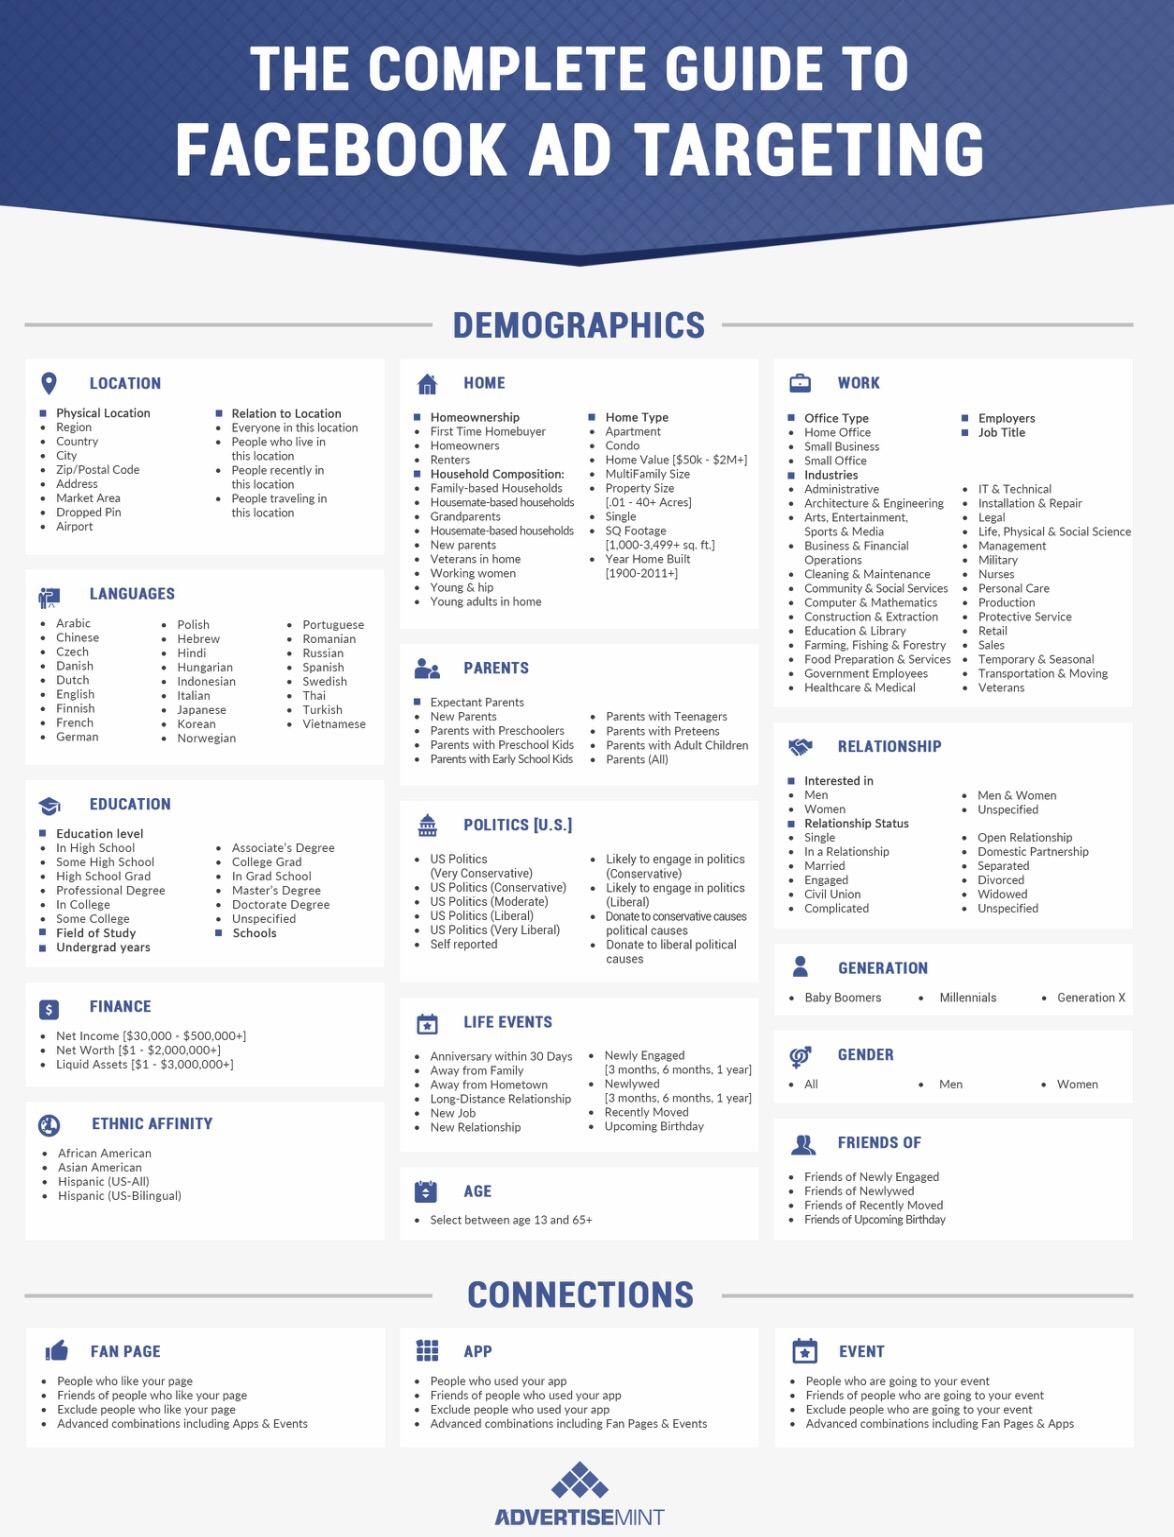 Guide facebook ad targeting :: สรุป Targeting ใน FacebookAd , เทคนิค เลือกกลุ่มเป้าหมายใน Facebook ad